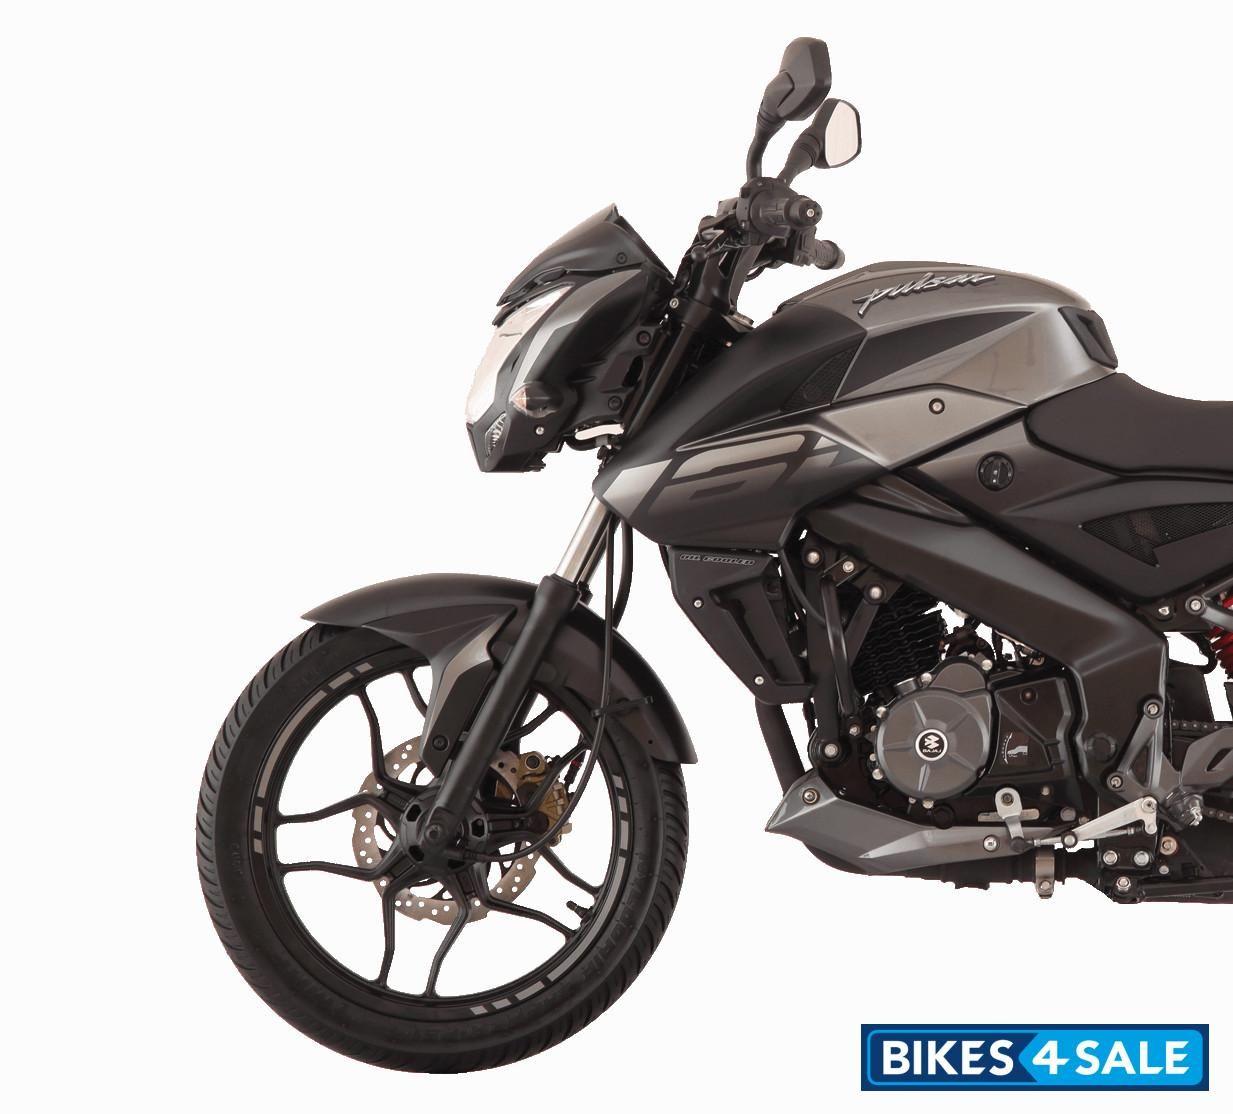 Bajaj Pulsar Ns 160 Pulsar Motorcycle Expo Colours